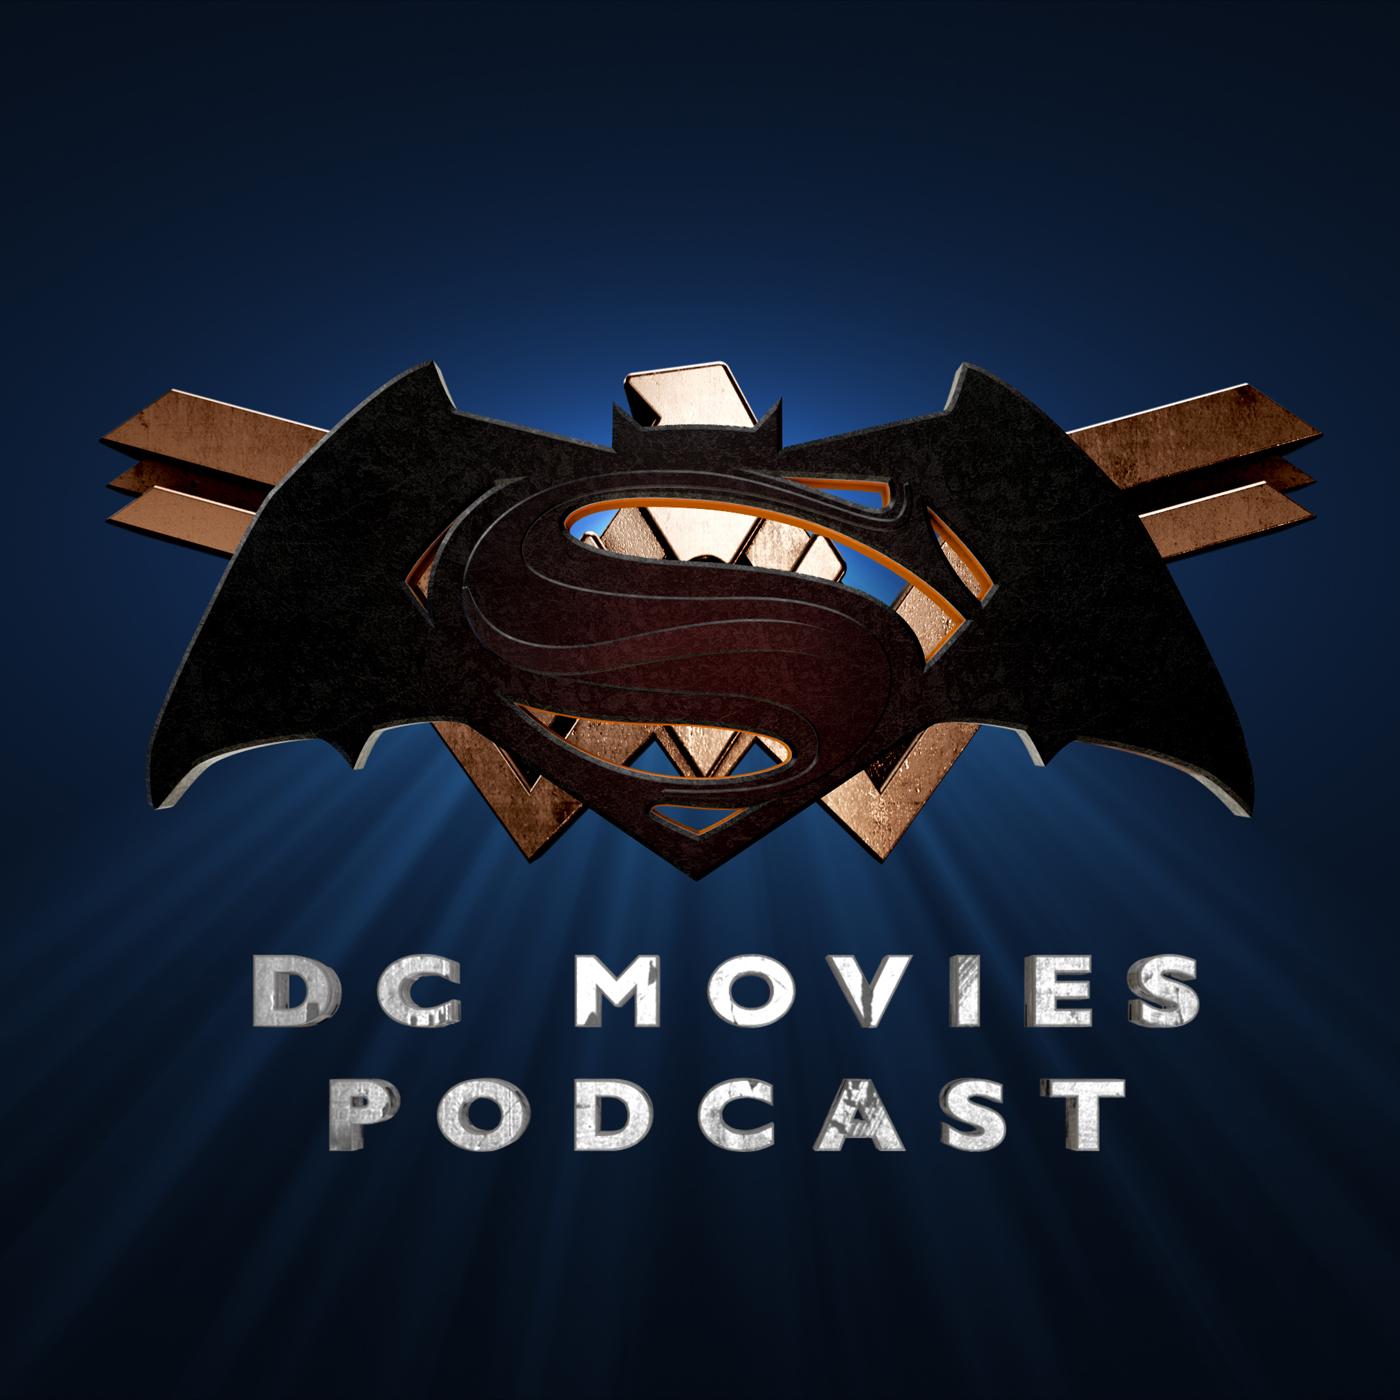 DCMoviesPodcast